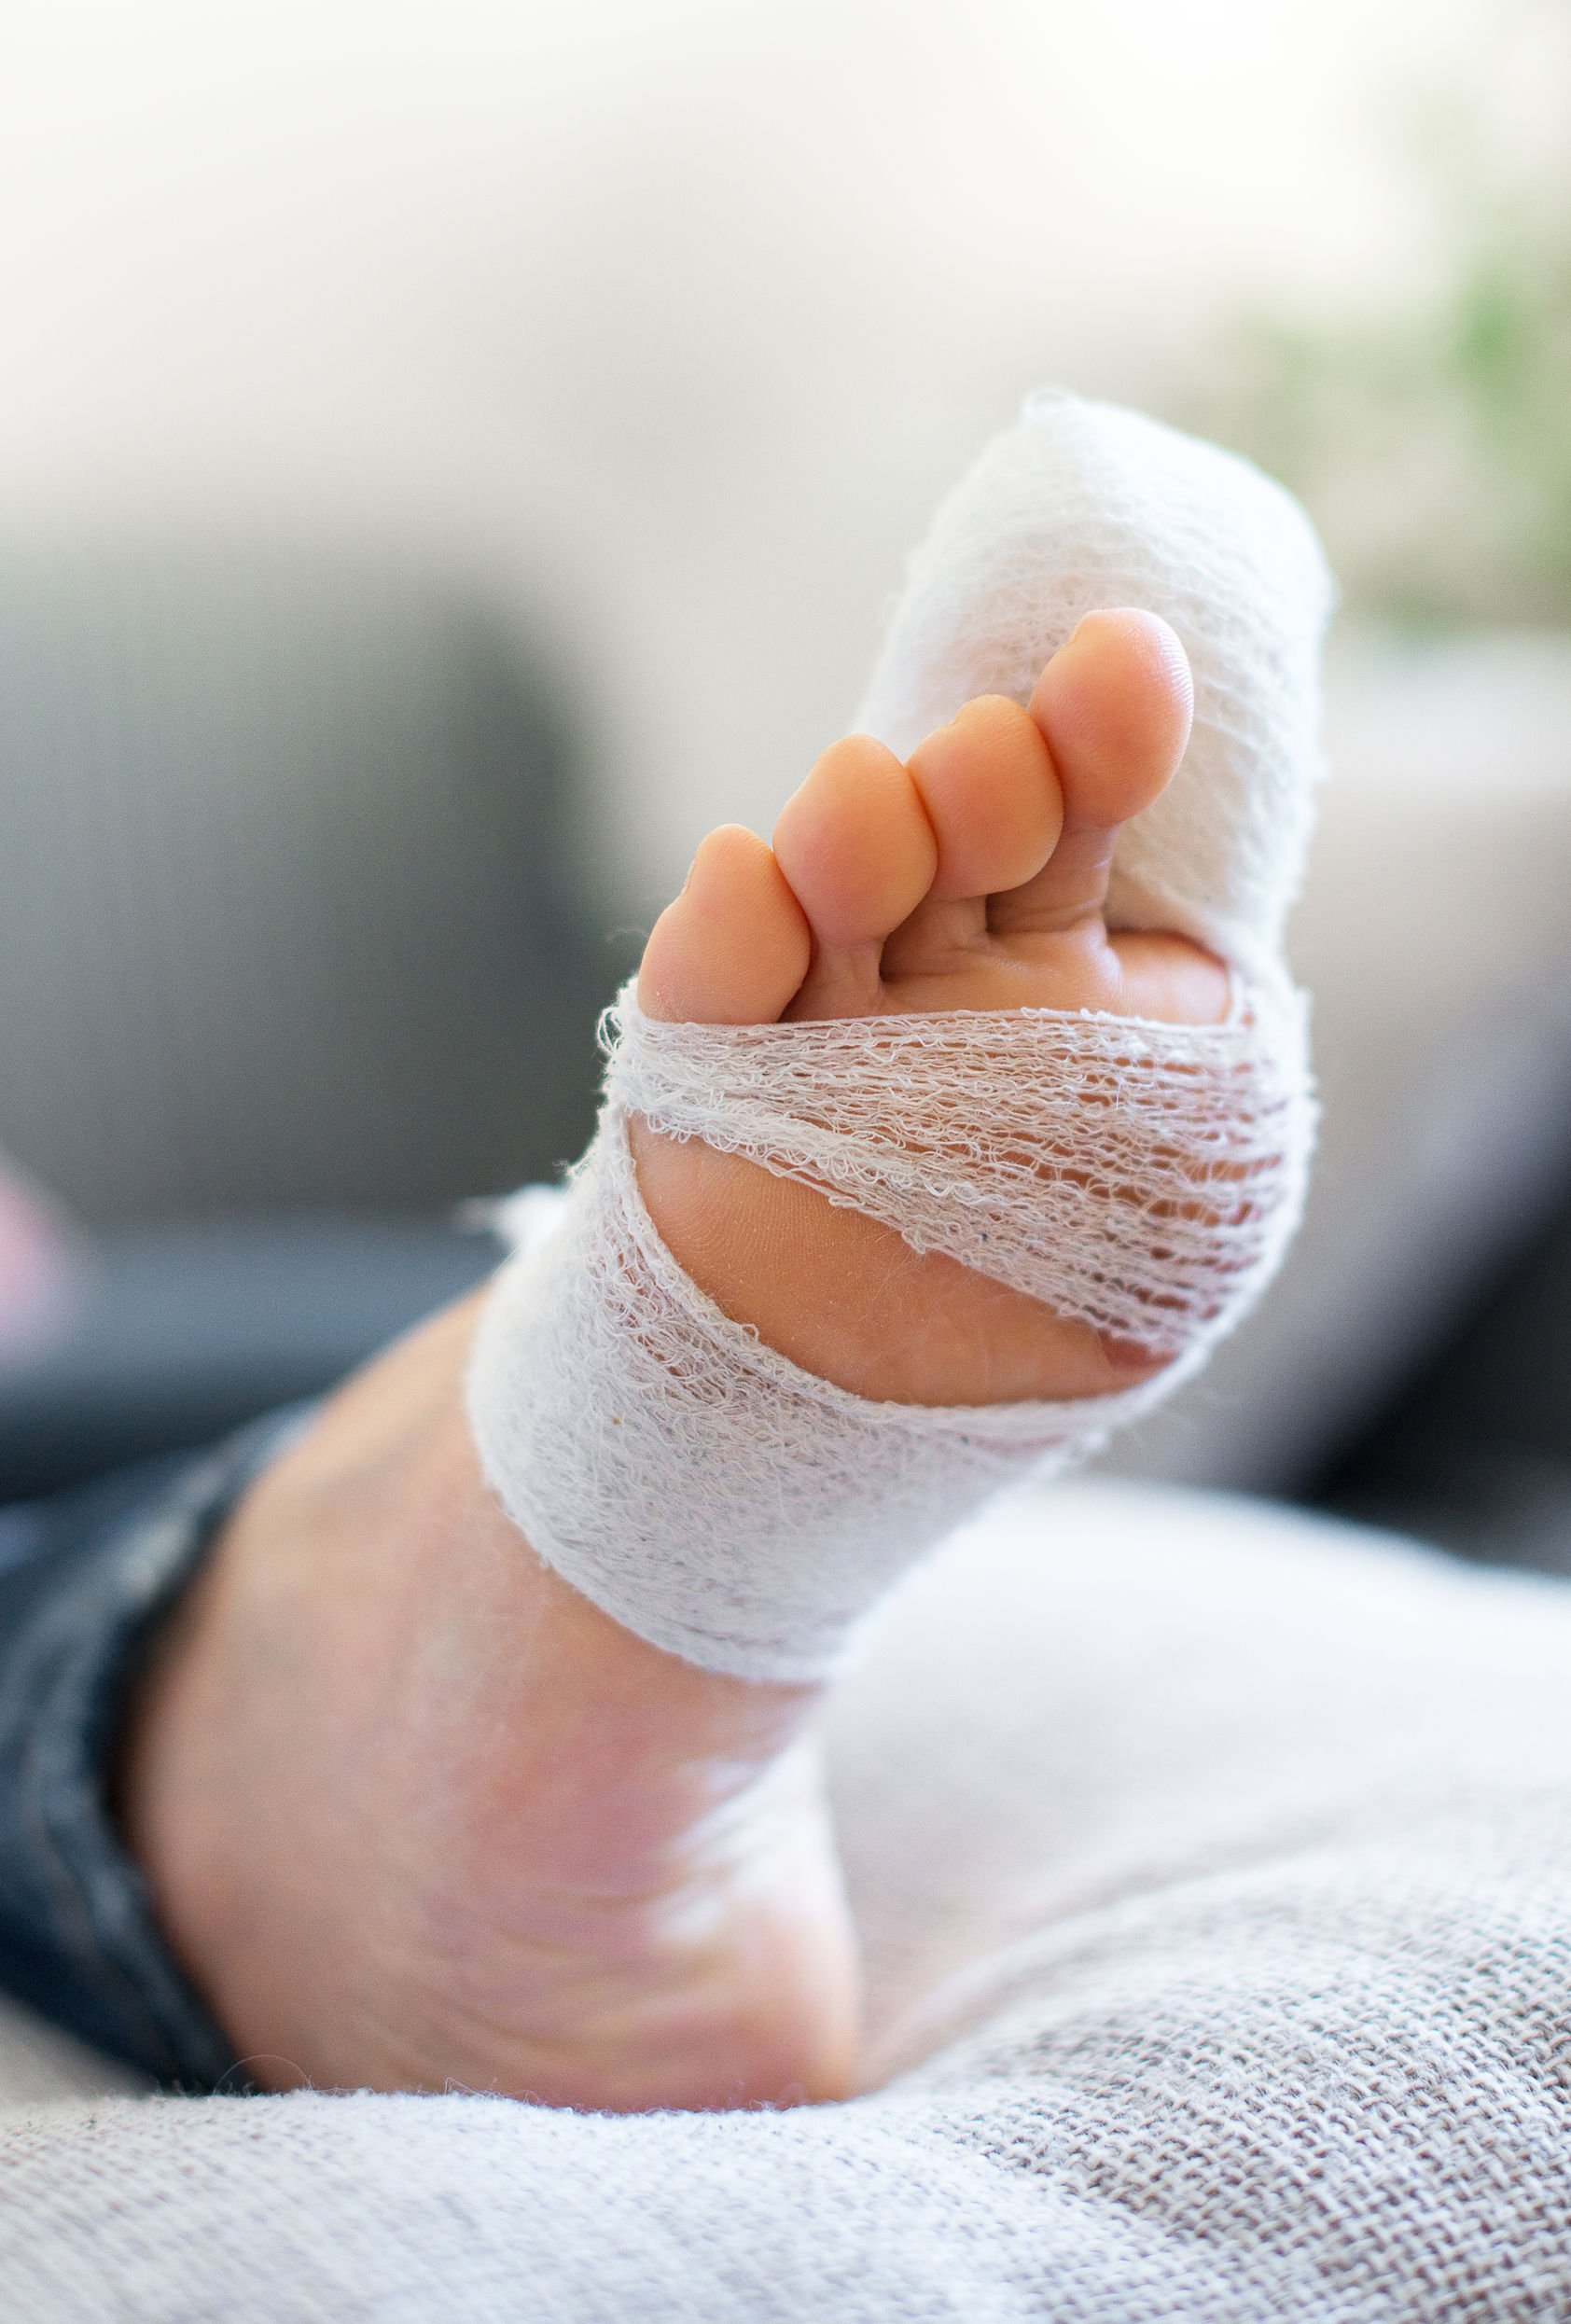 Broken Toe | DermalMedix